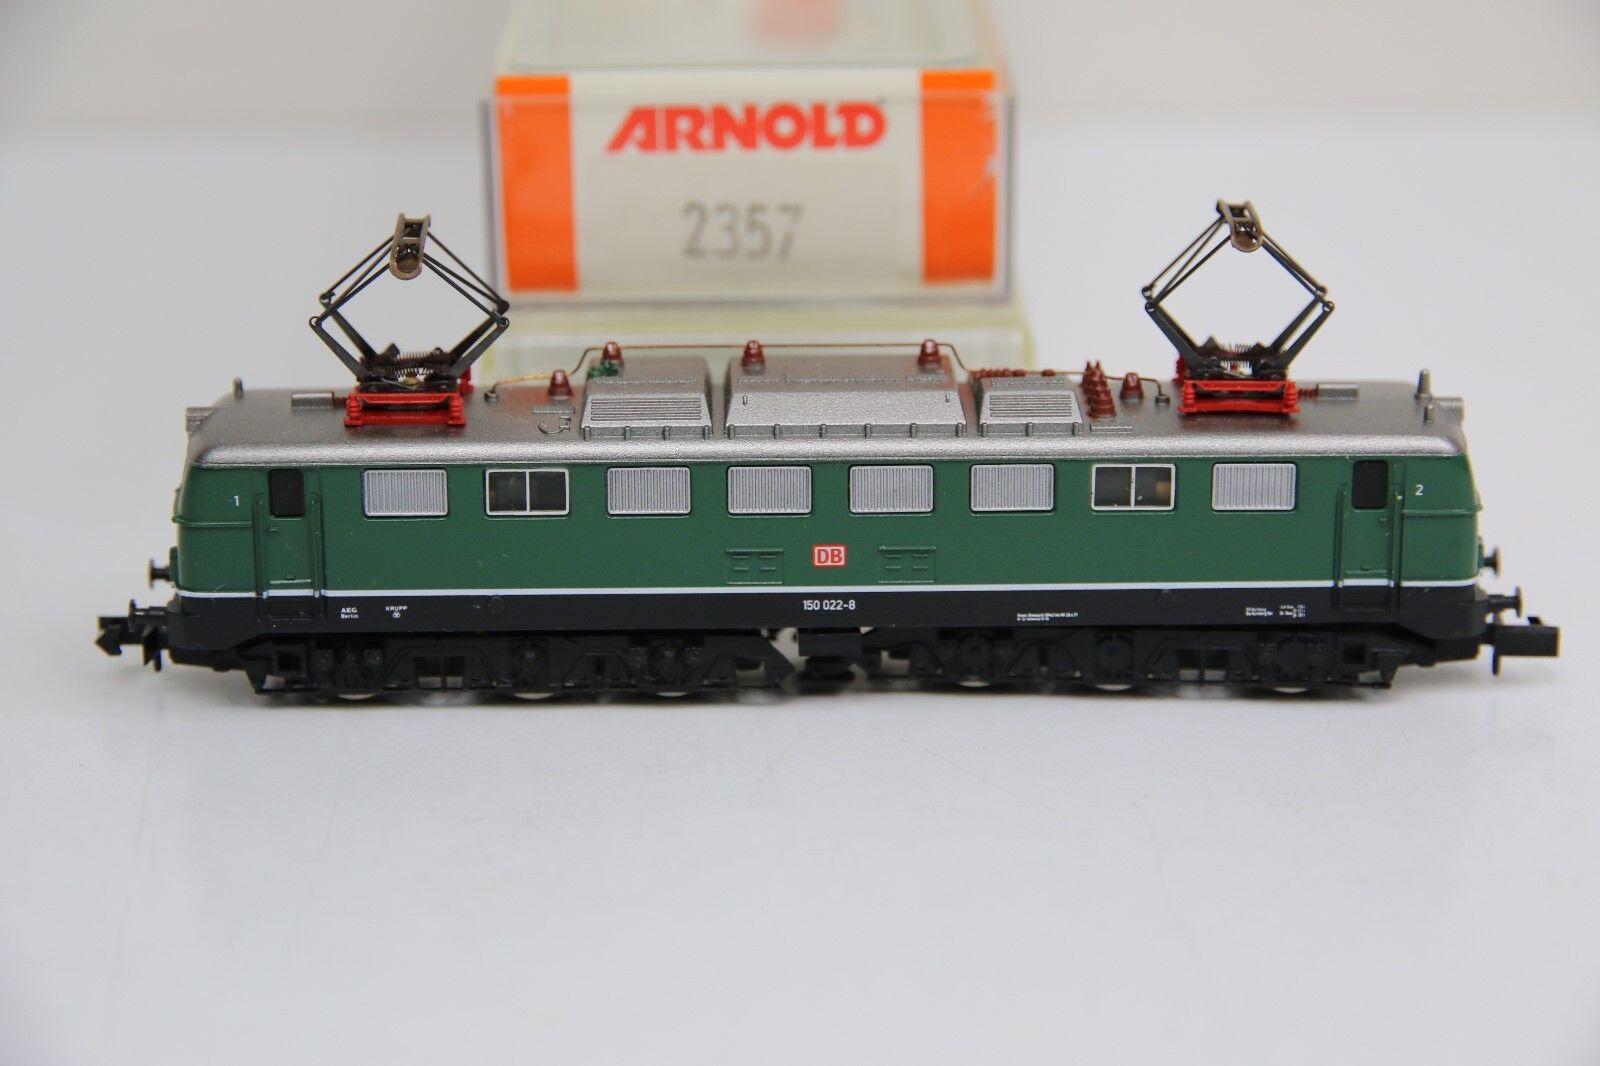 Arnold pista n 2357 e-Lok br 150 022-8 de la DB en embalaje original (rb7107)